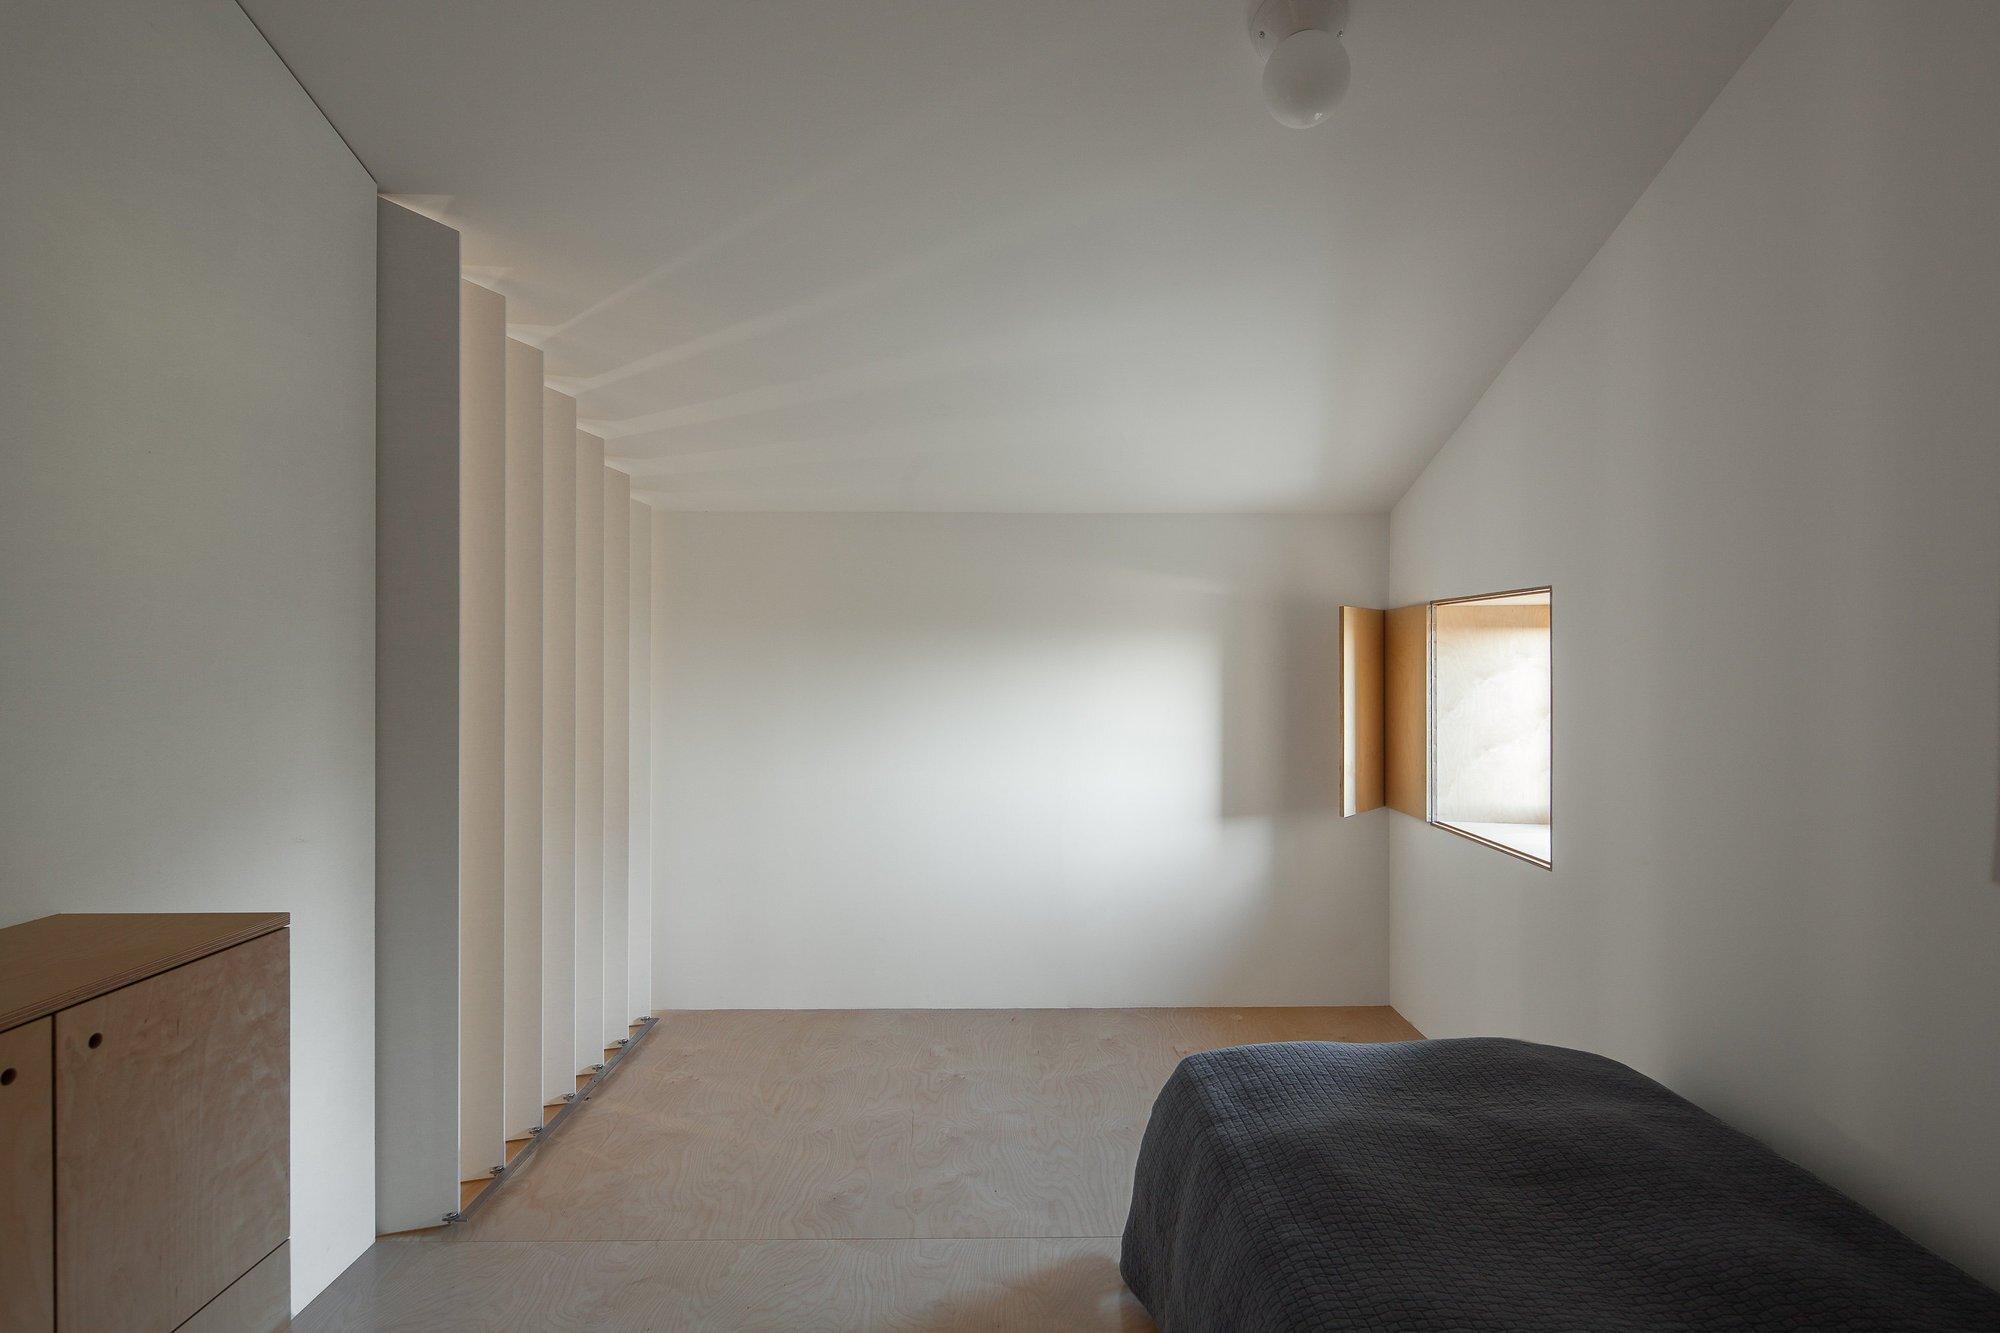 Nogueiras House - Sofia Parente + André Delgado - Portugal - Bedroom - Humble Homes